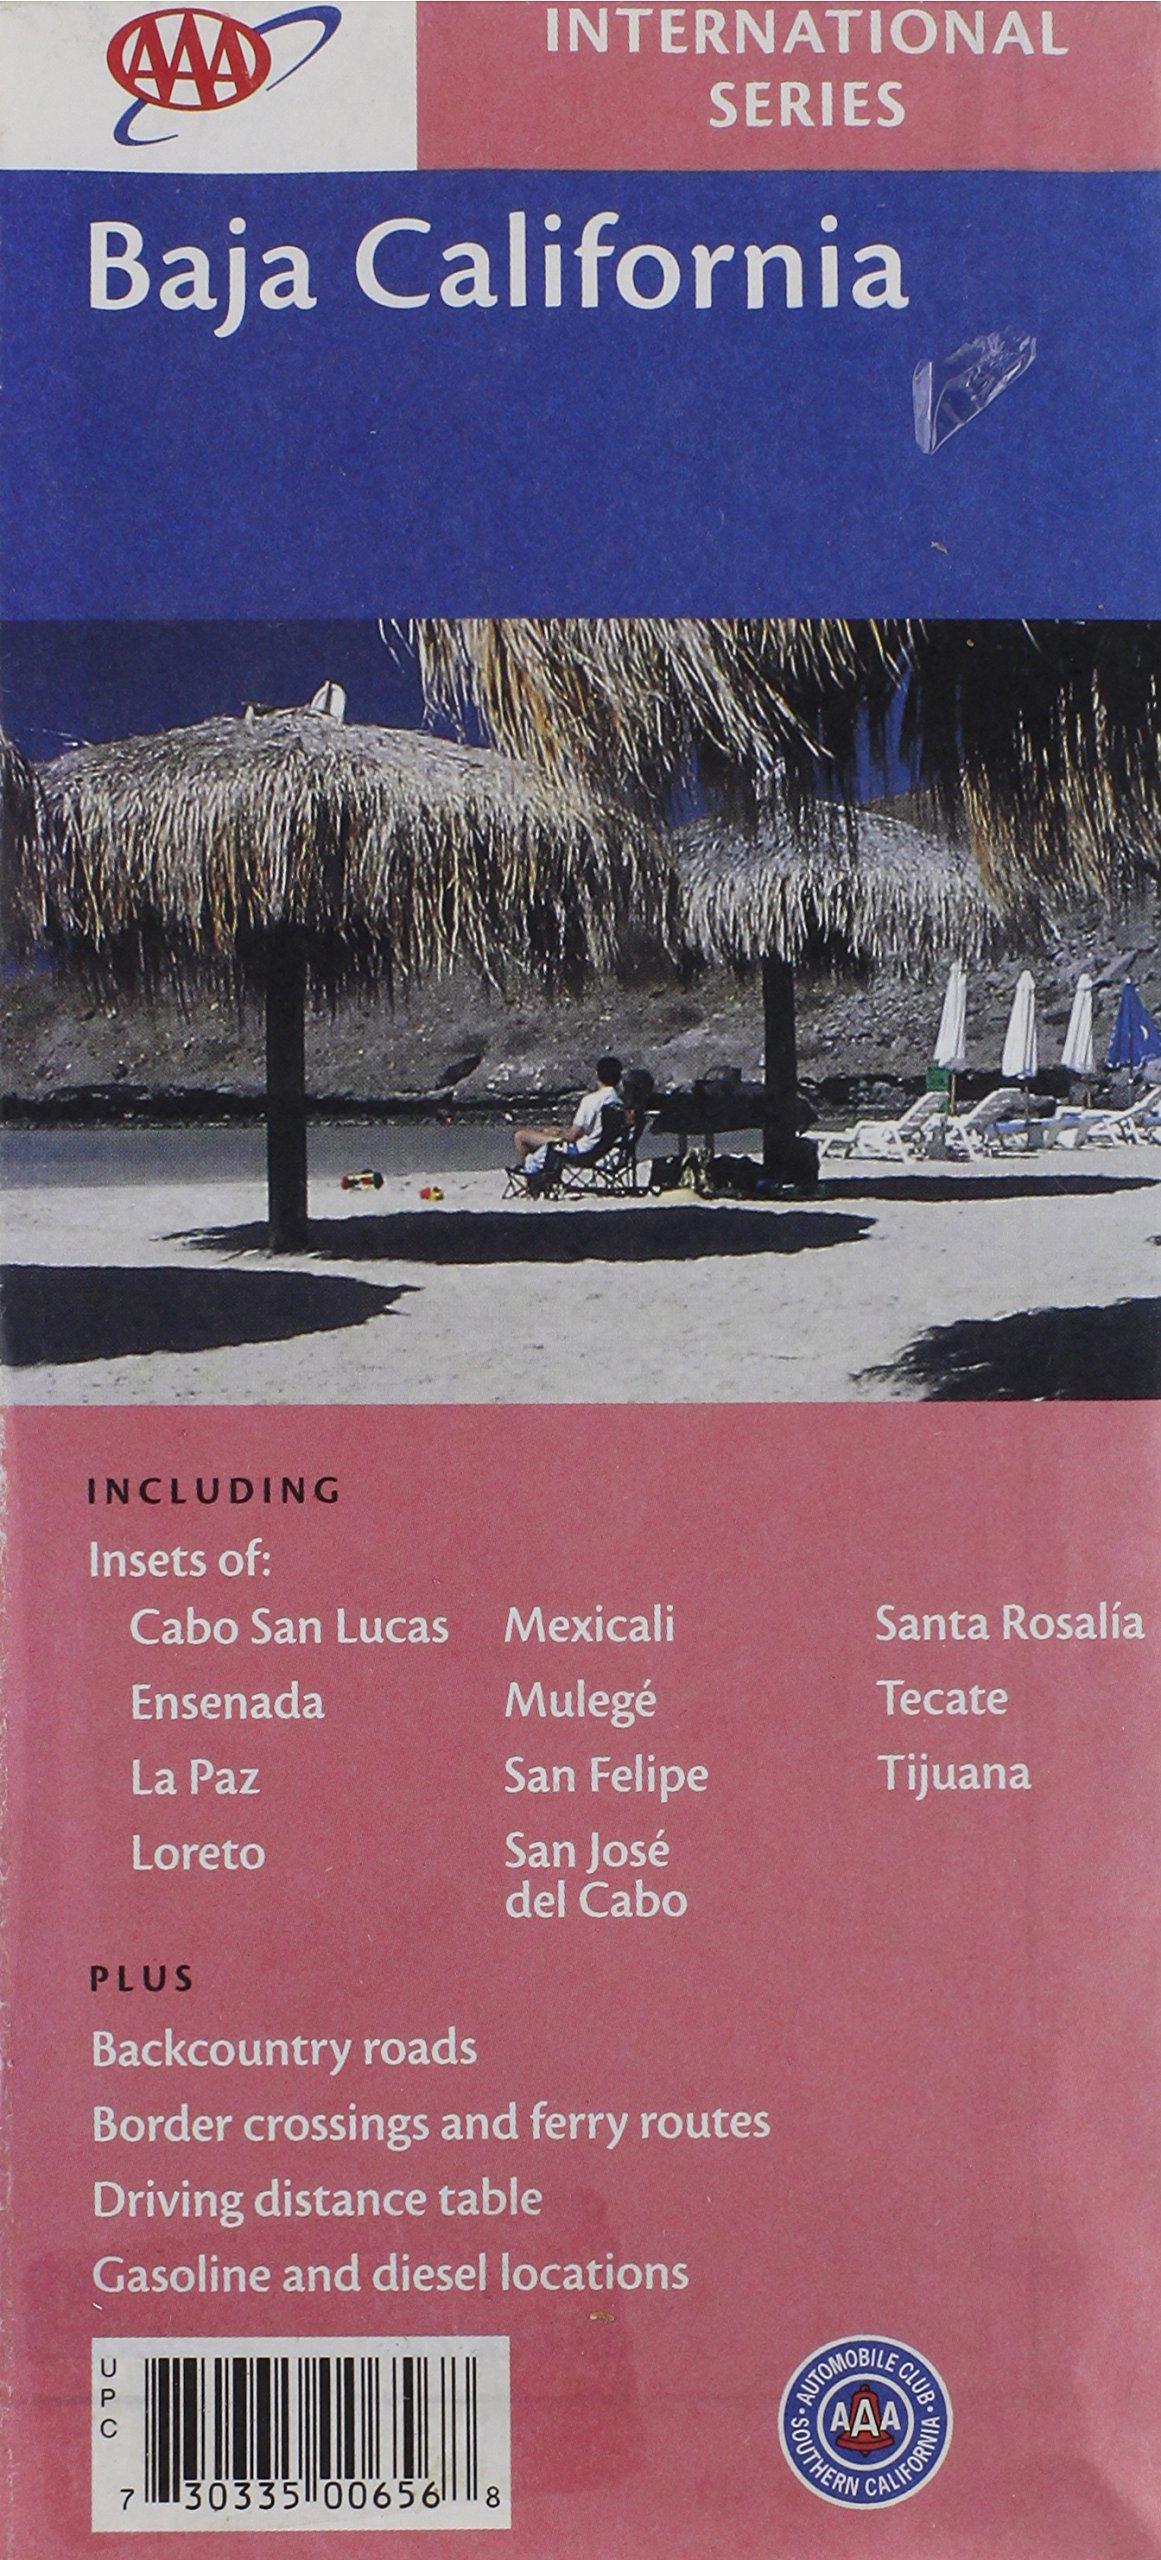 Read Online AAA Baja California: Cabo San Lucas, Ensenada, La Paz, Loreto, Mexicali, Mulege, San Felipe, San Jos pdf